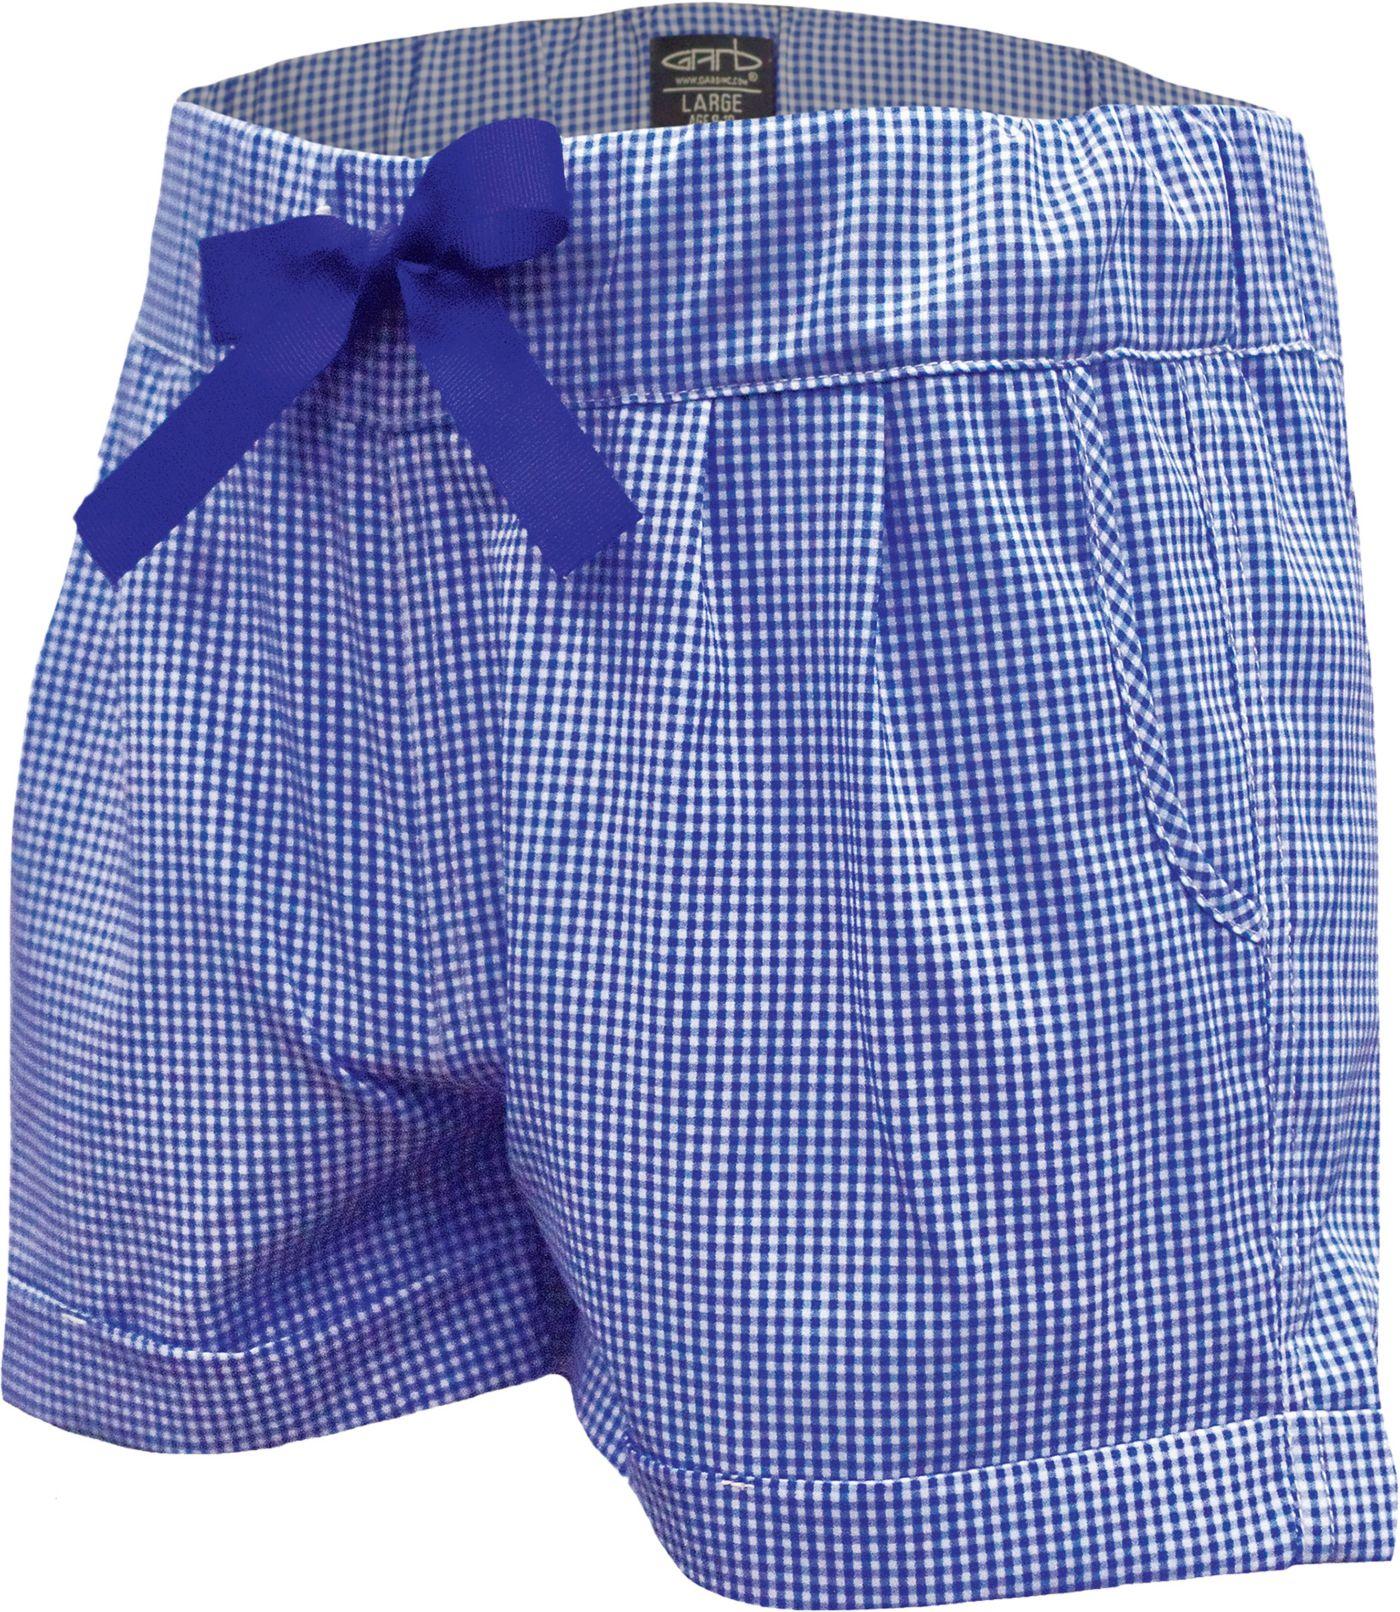 Garb Girls' Tina Golf Shorts